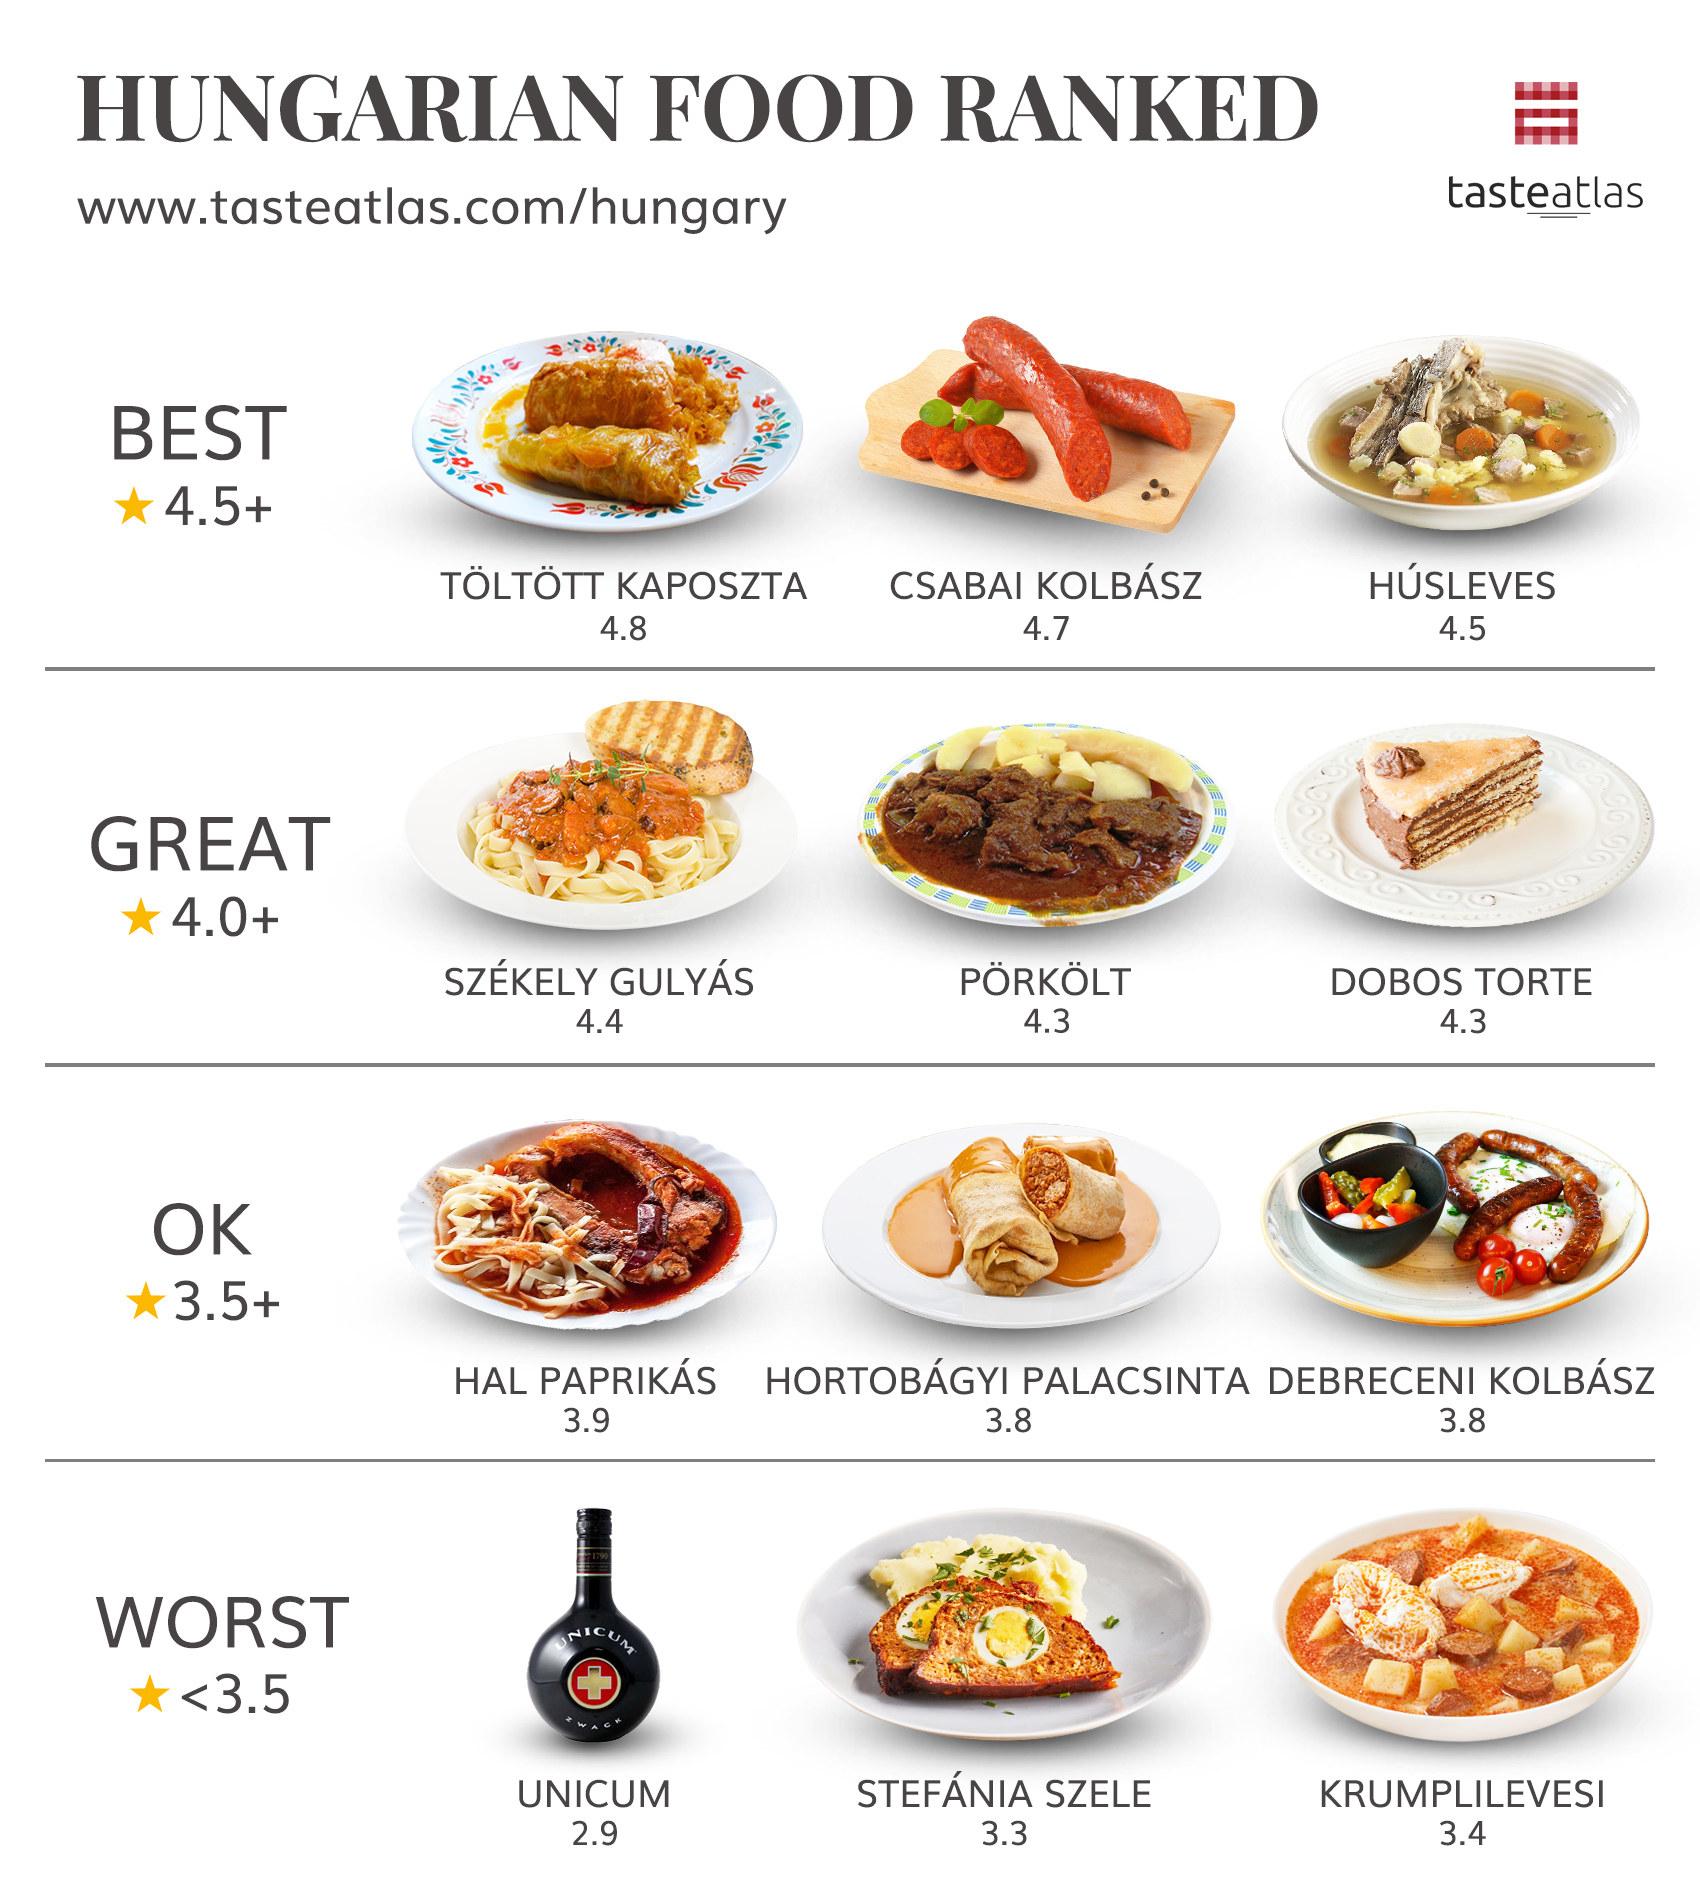 Graphic showing Toltott Kaposzta ranked best